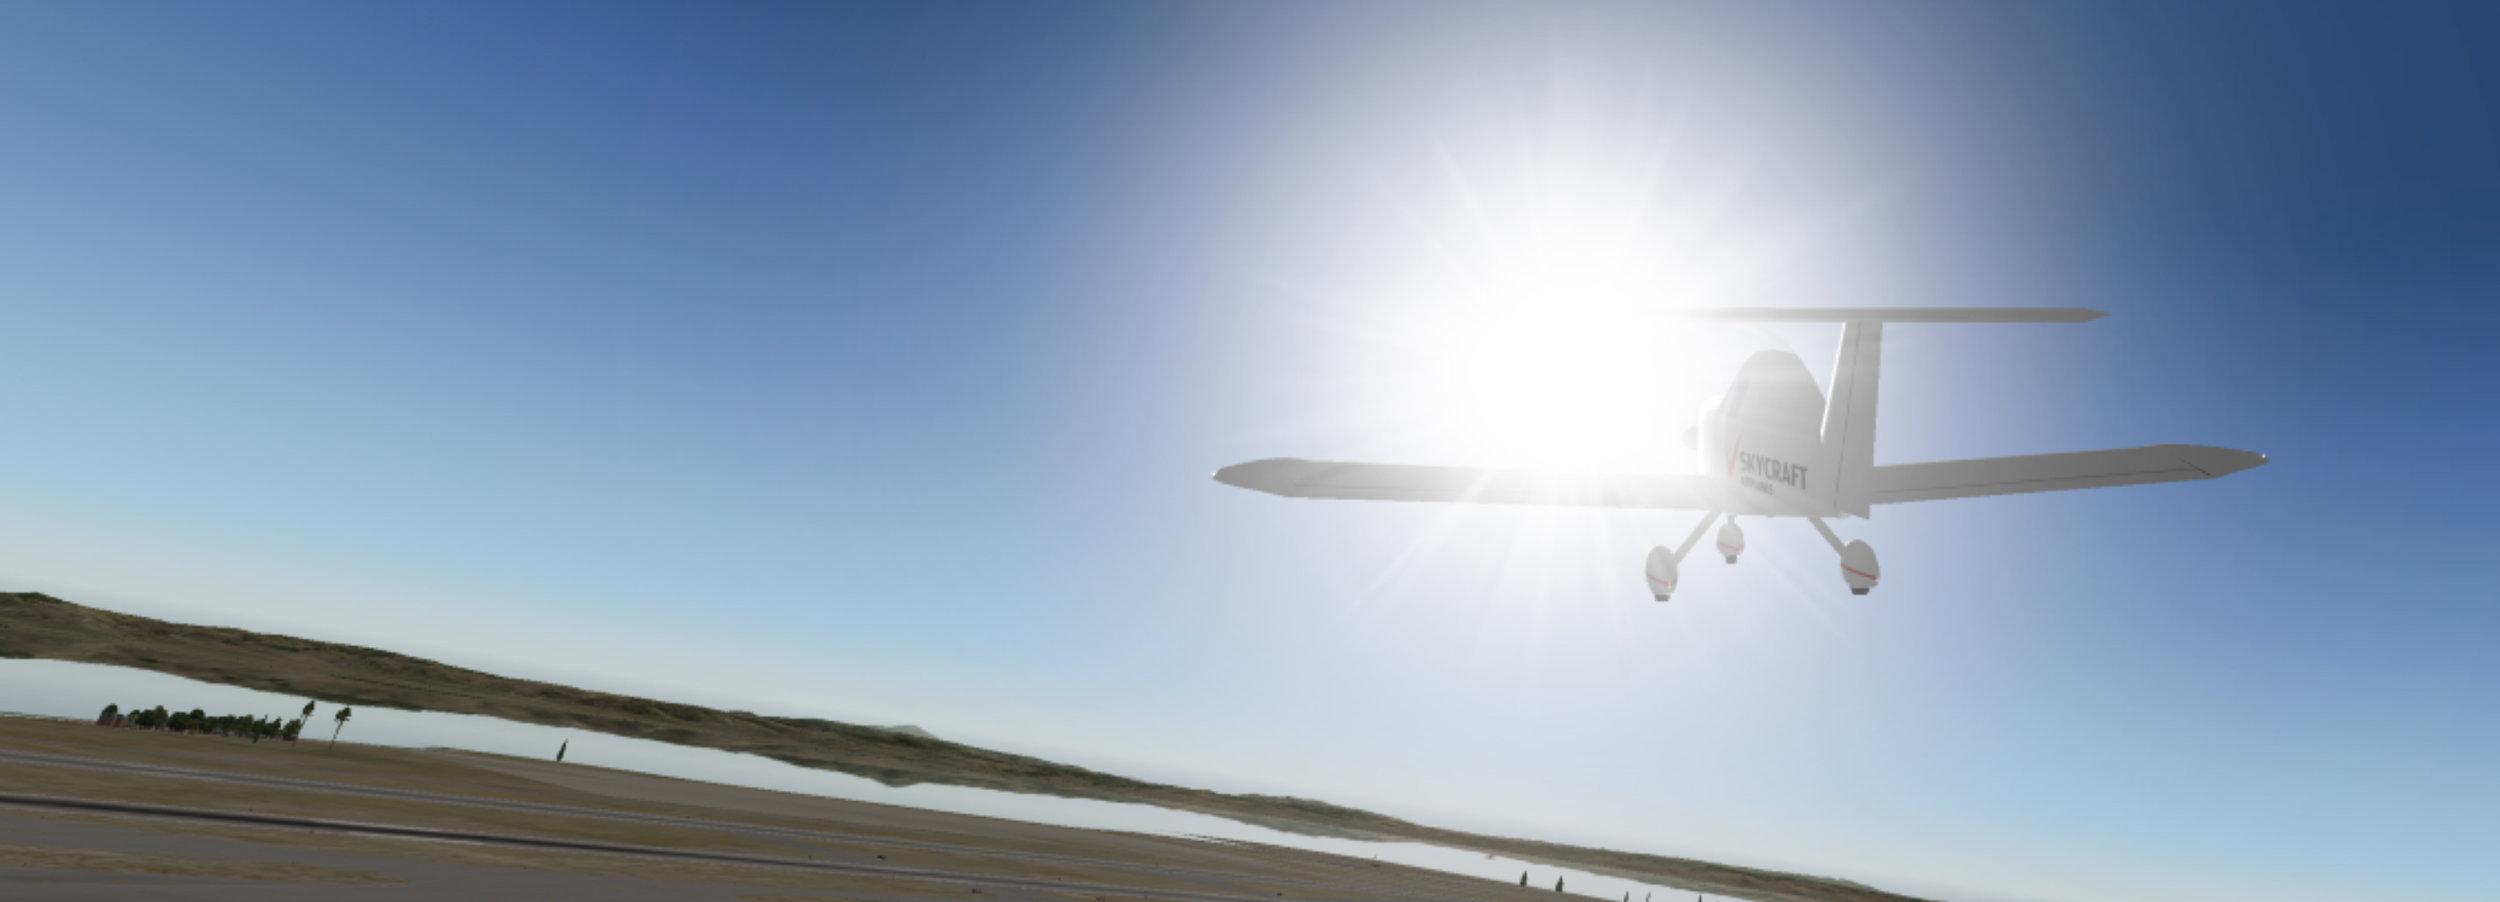 flying-into-sun.jpg